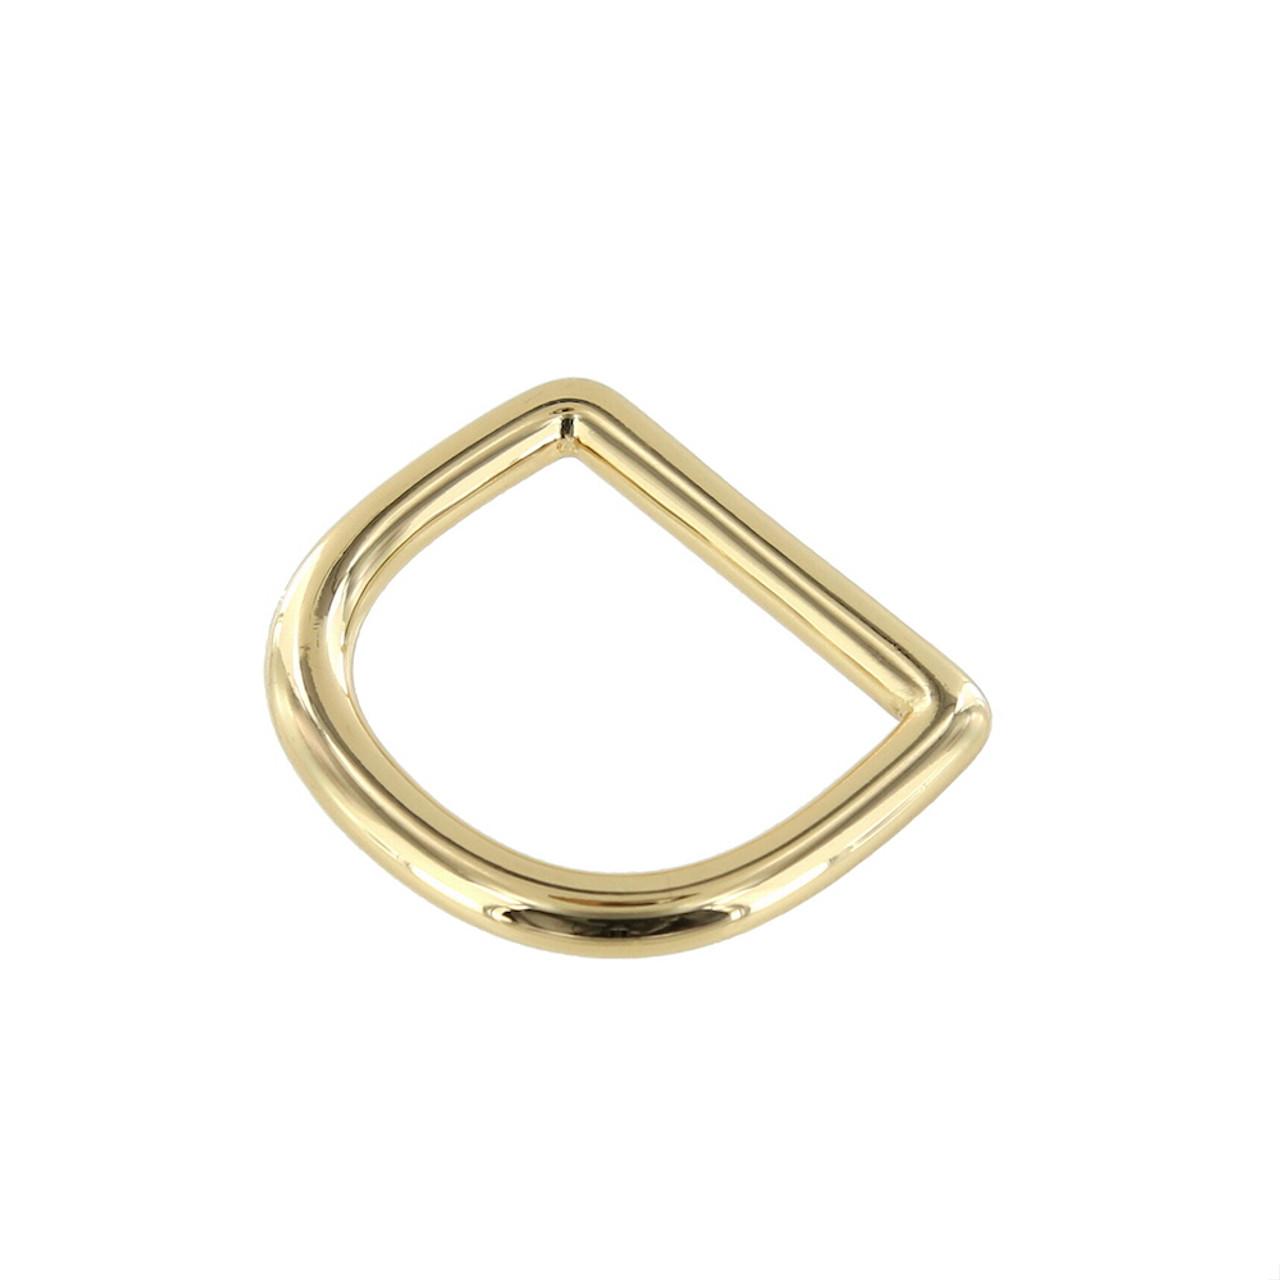 6pcs Alloy D-ring 12mm D-Ring Purse Dring Handbag making supplies  in gold,silver,black